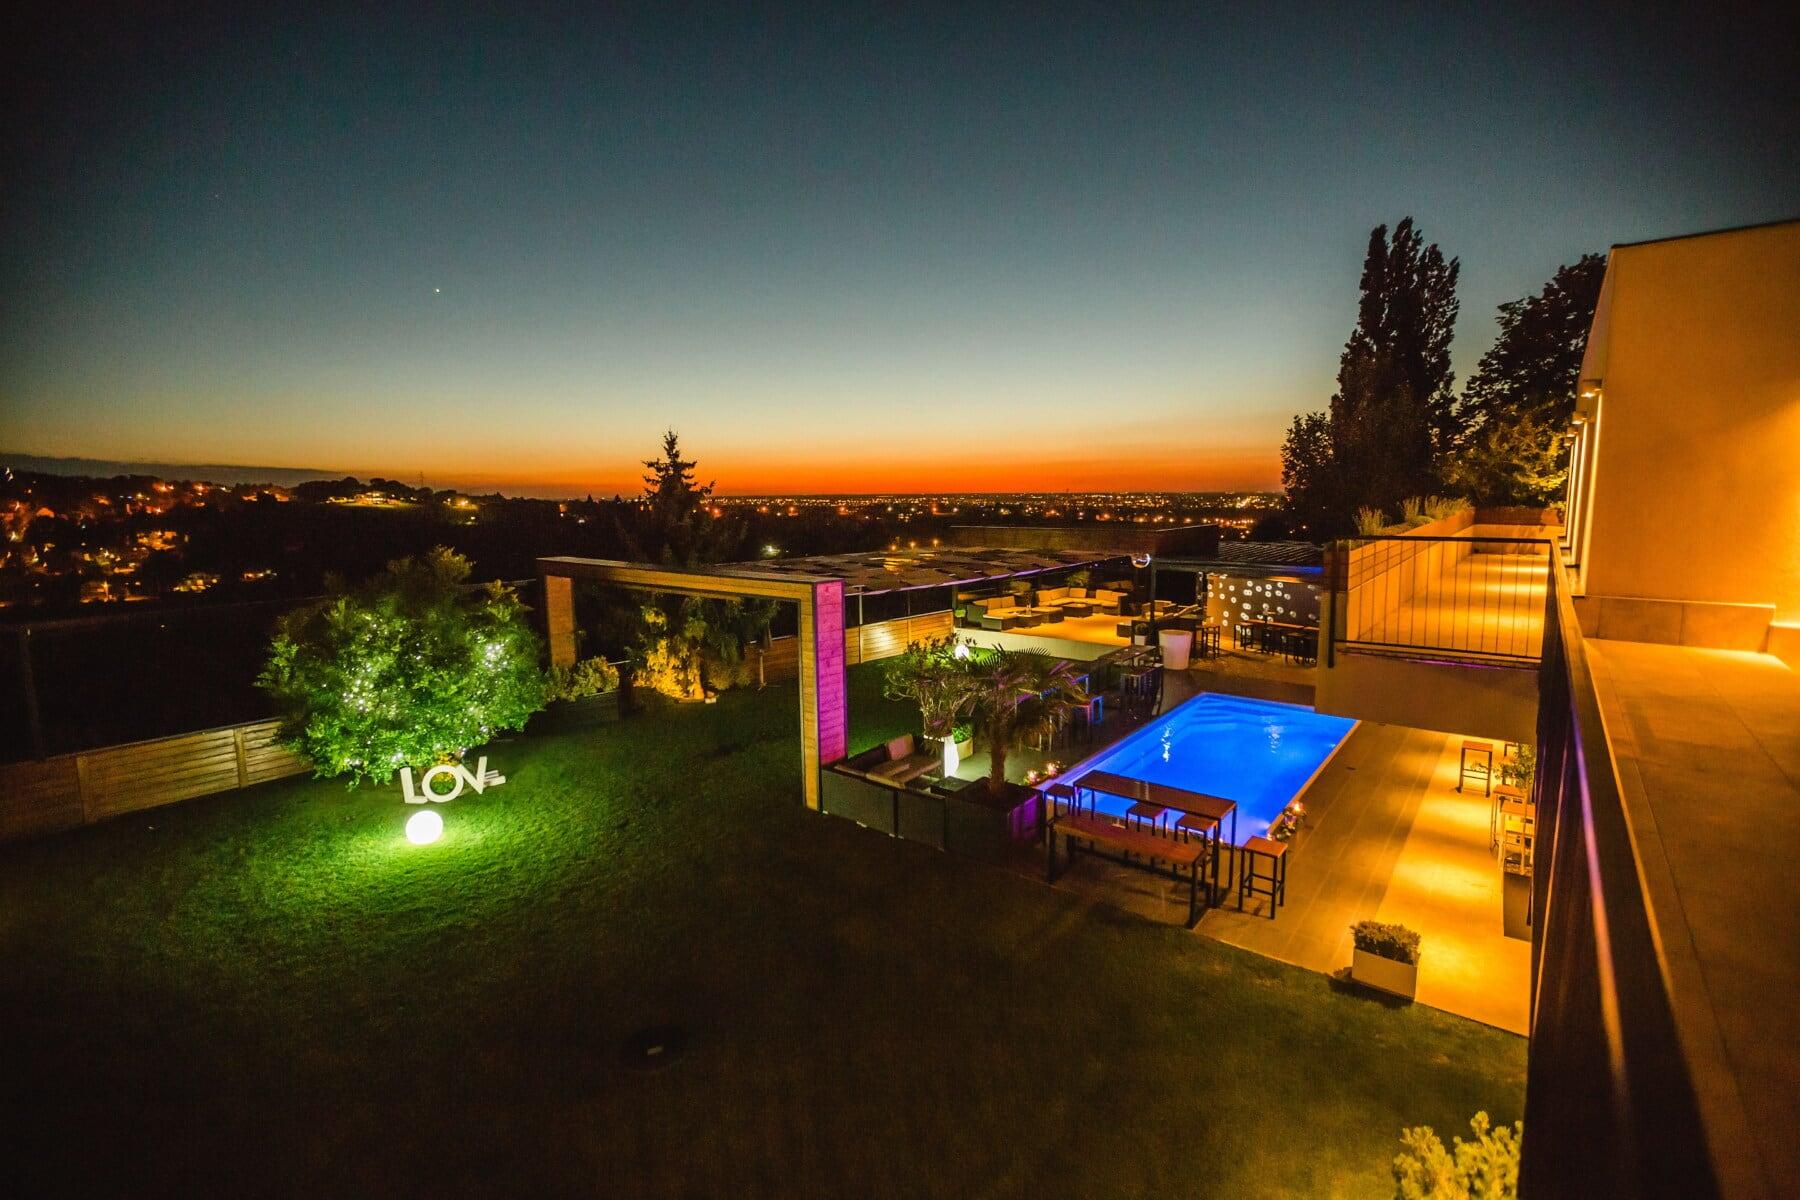 restaurant, nighttime, swimming pool, sunset, nightclub, hotel, palace, nightlife, resort area, light